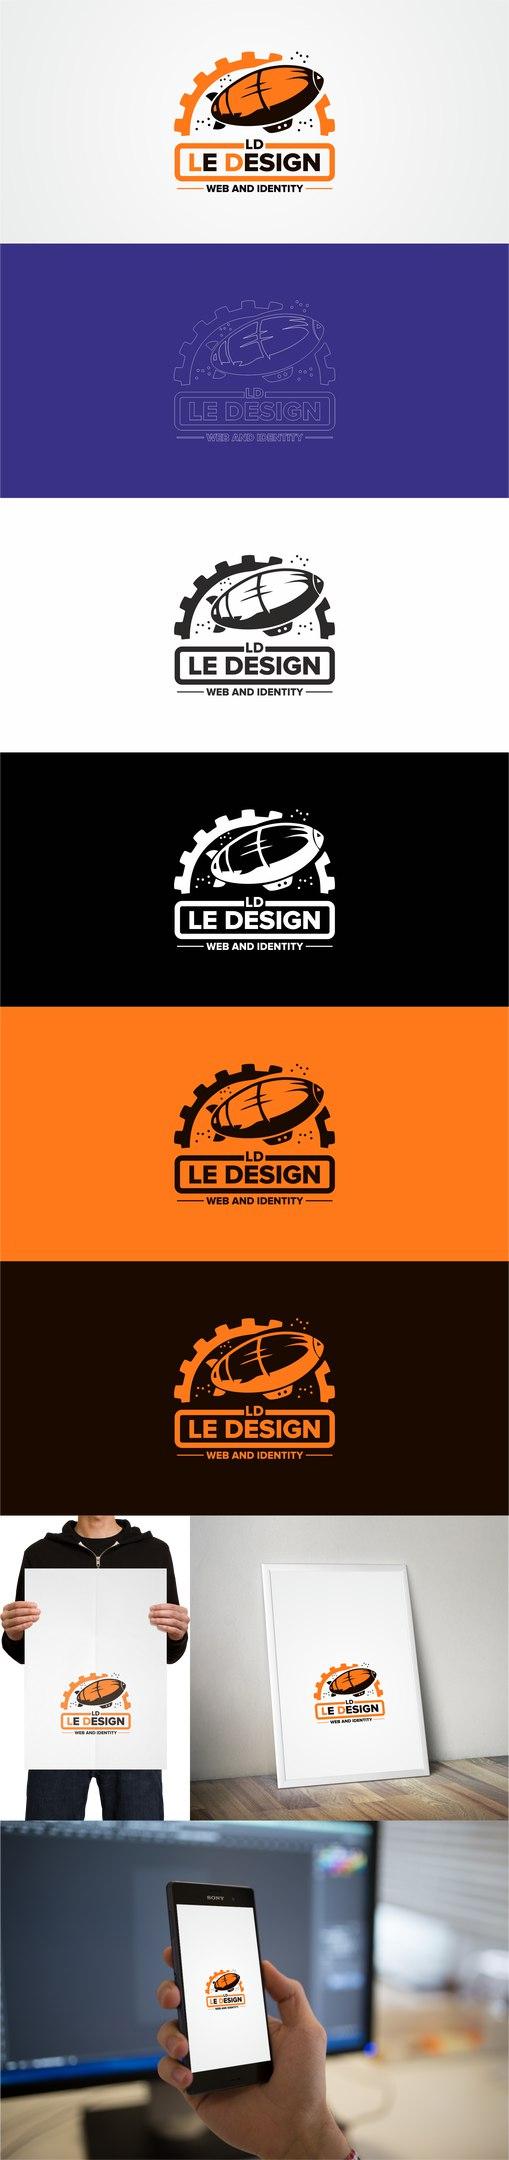 Разработка логотипа Le Design